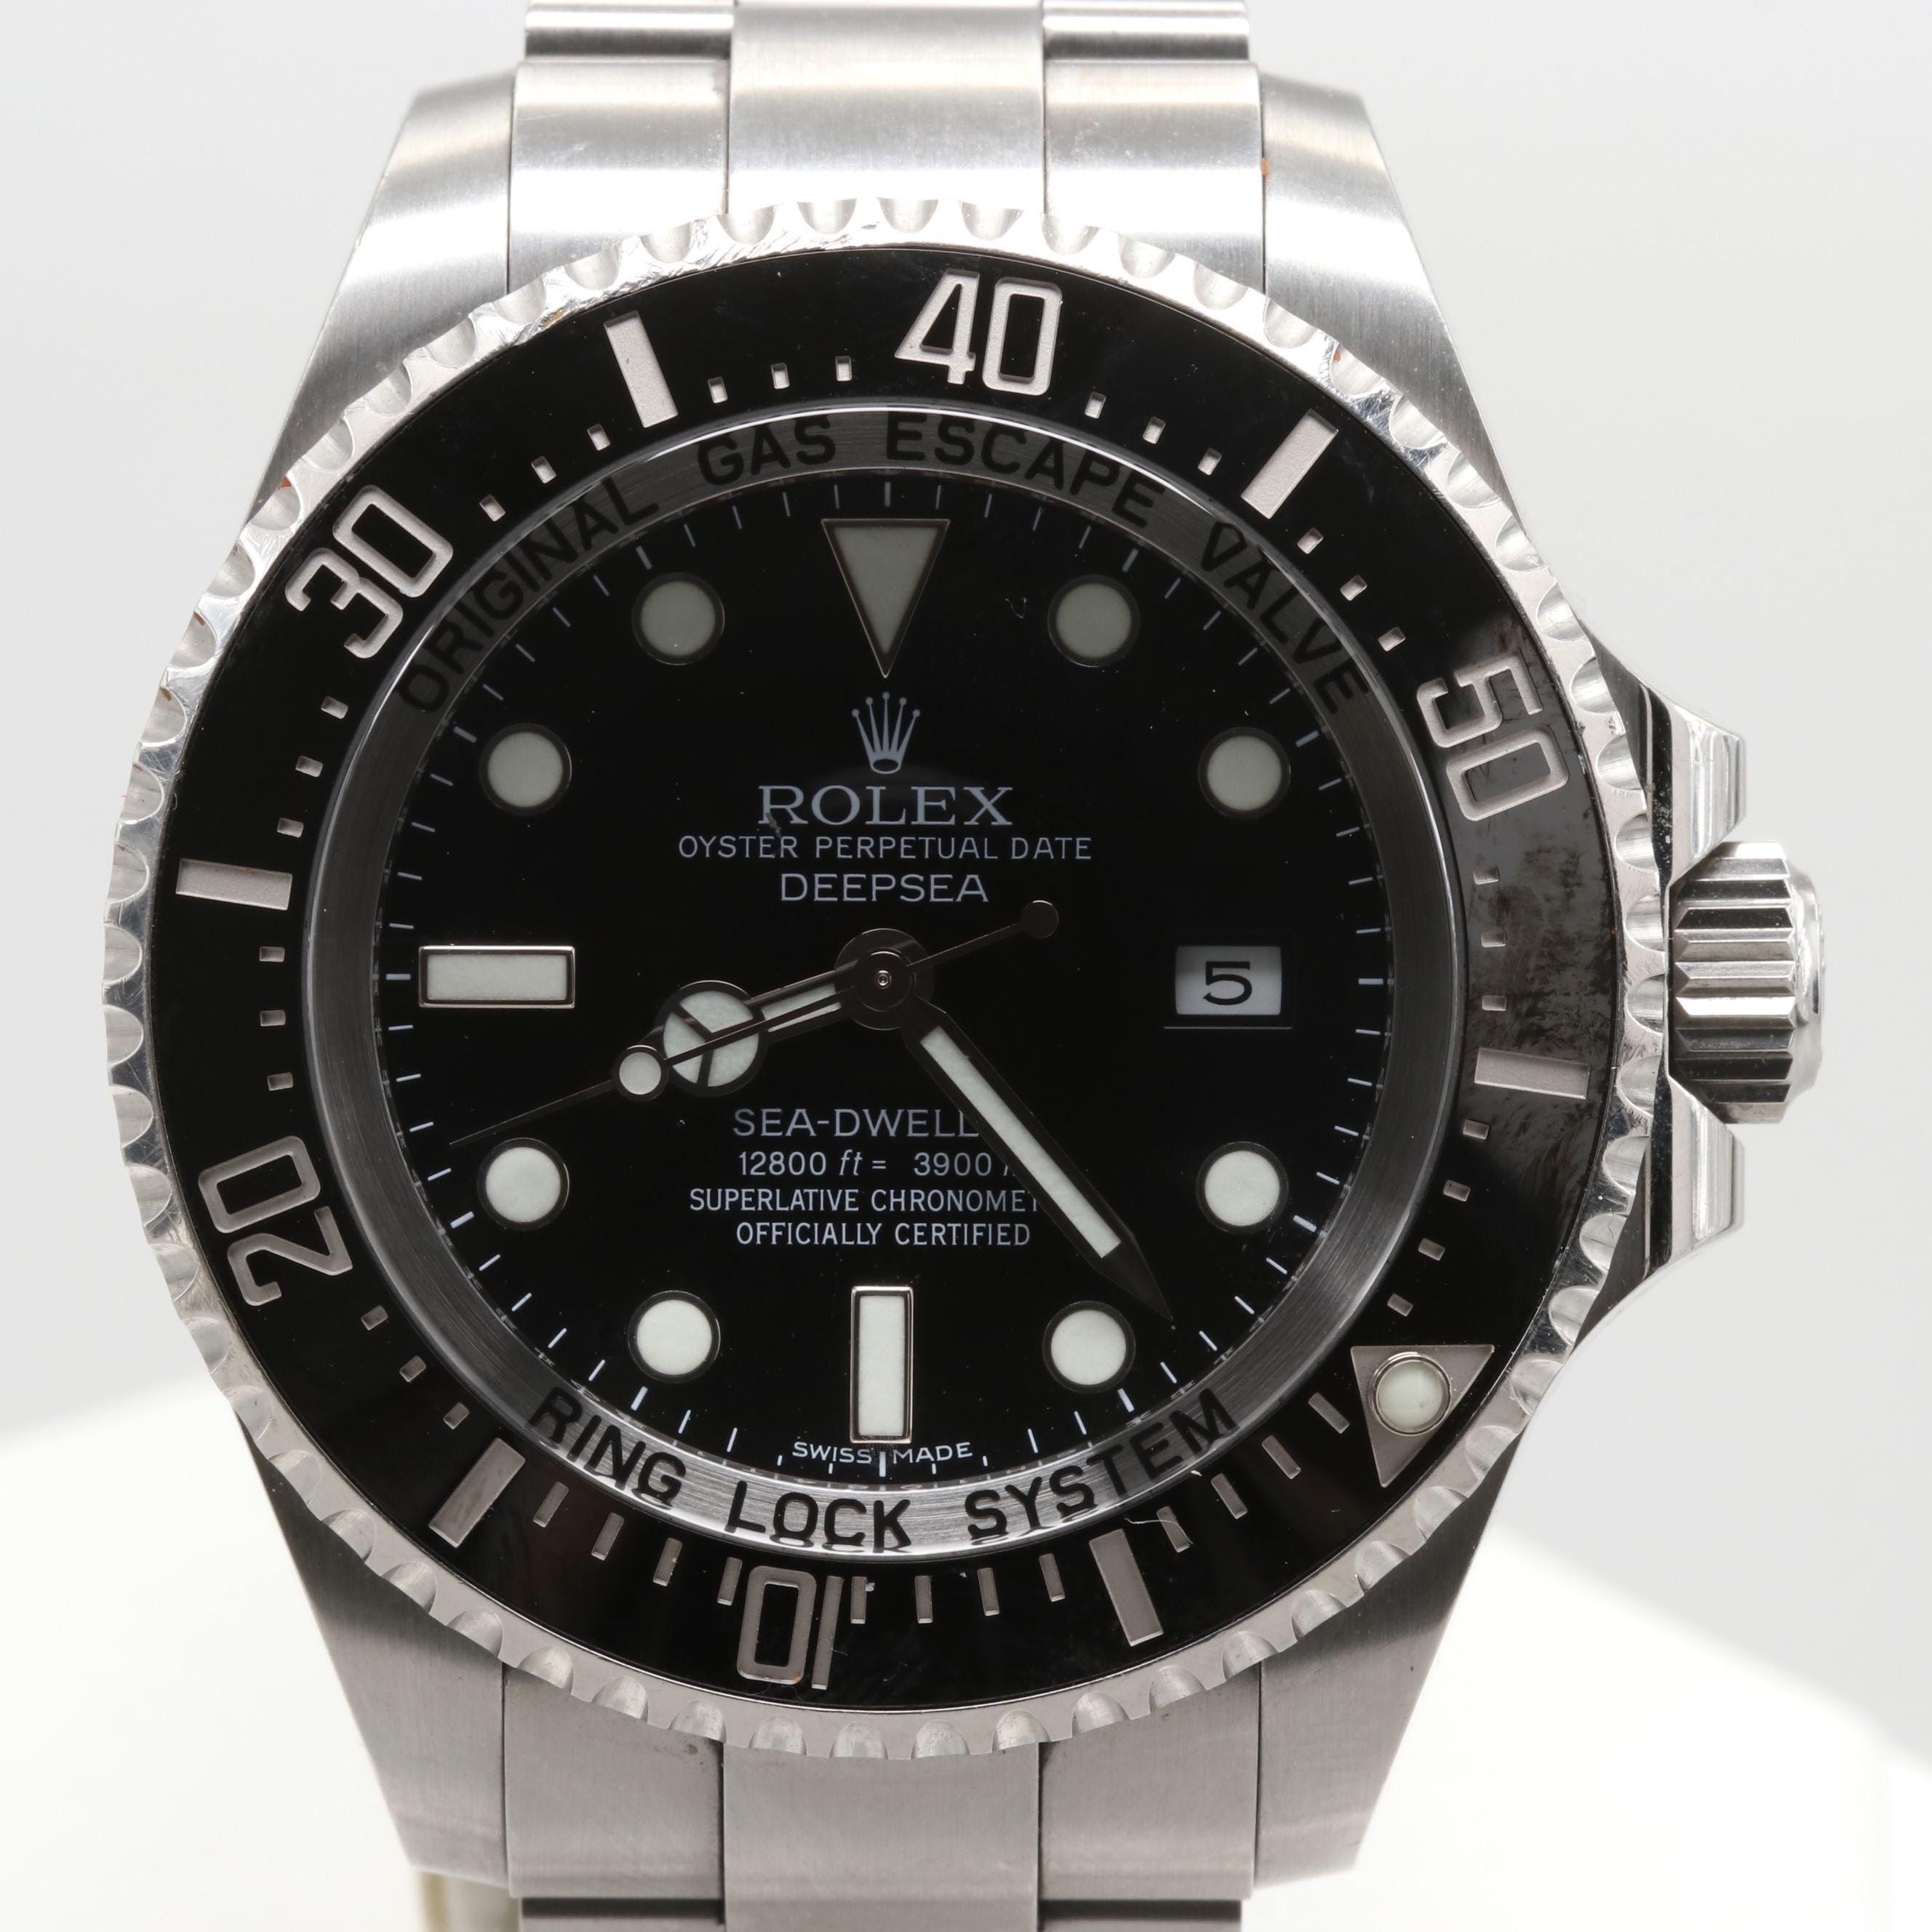 Rolex Stainless Steel Sea-Dweller Deep Sea Automatic Wristwatch